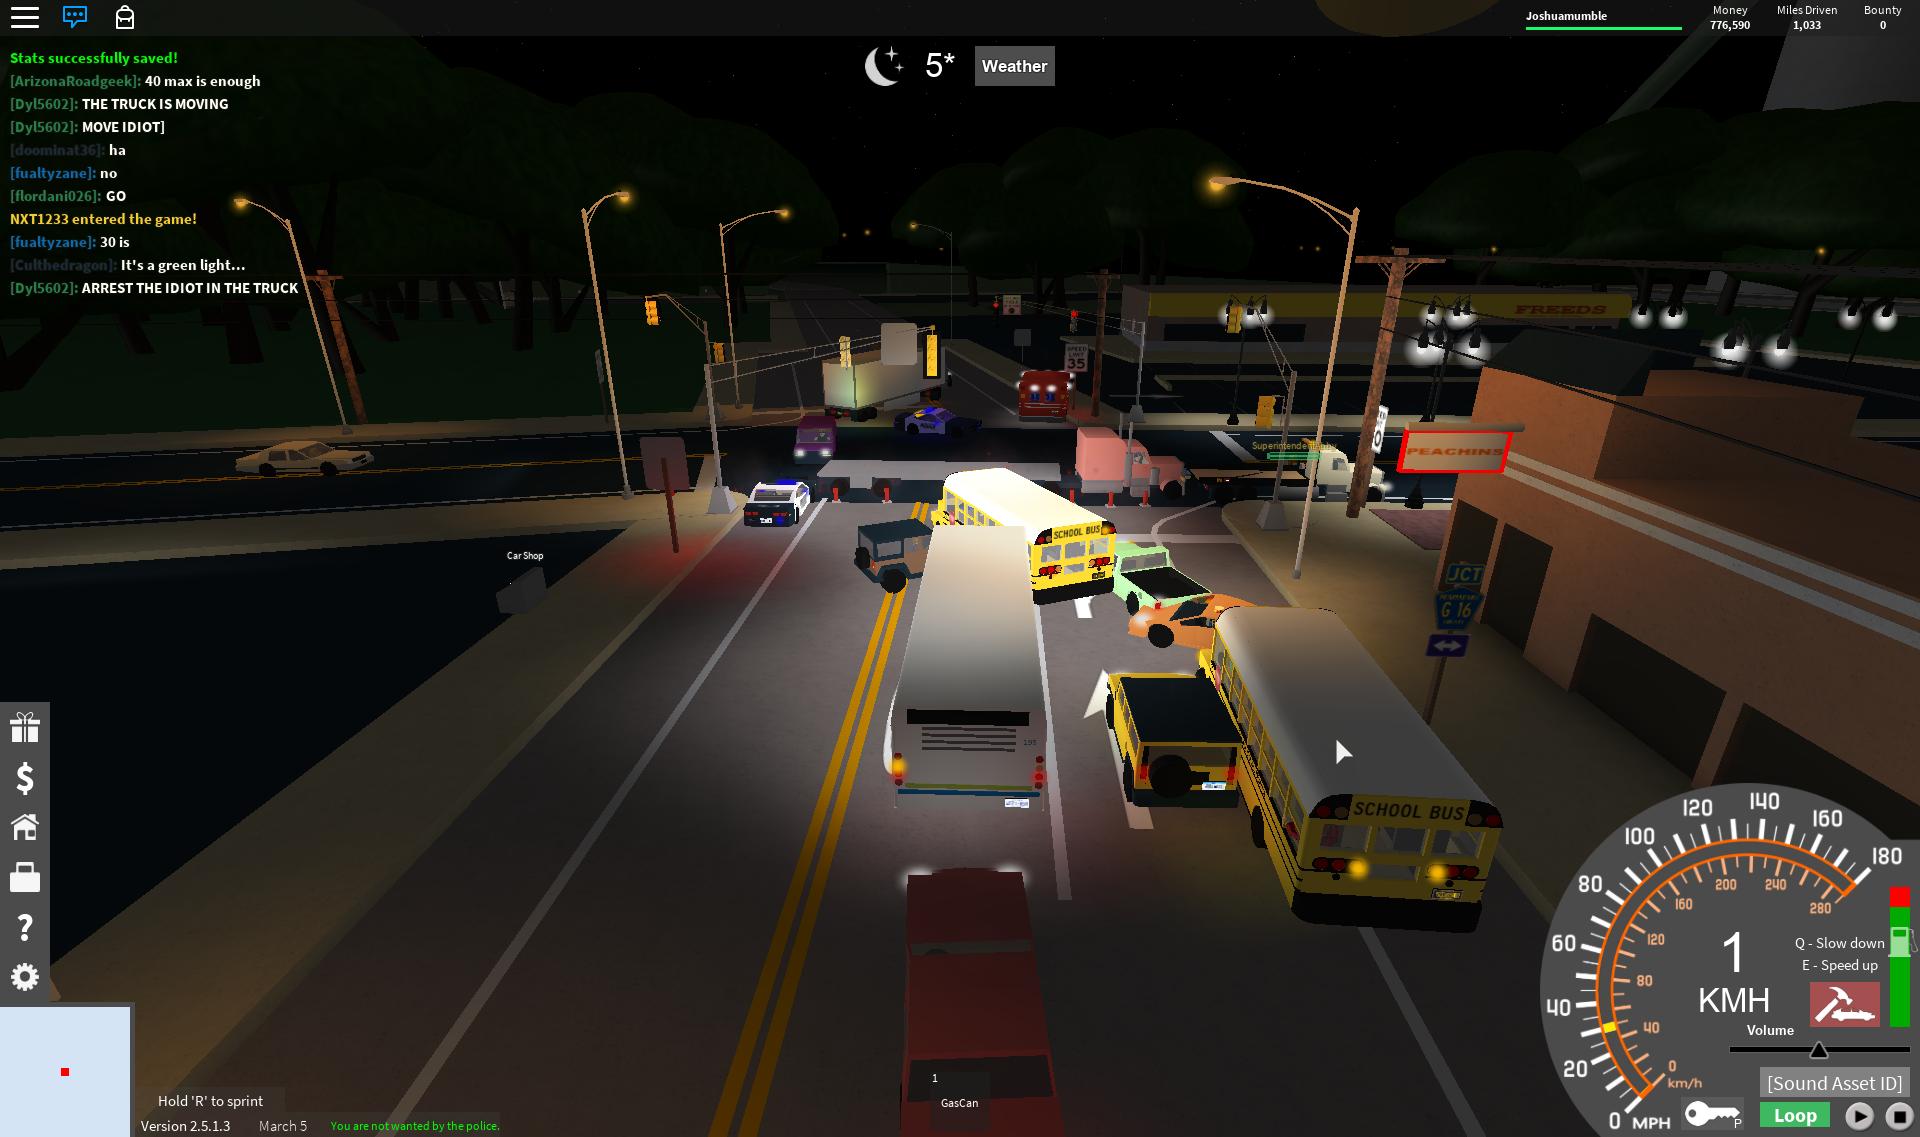 Ud Council Bluffs Ultimate Driving Roblox Wikia Fandom - roblox school bus games